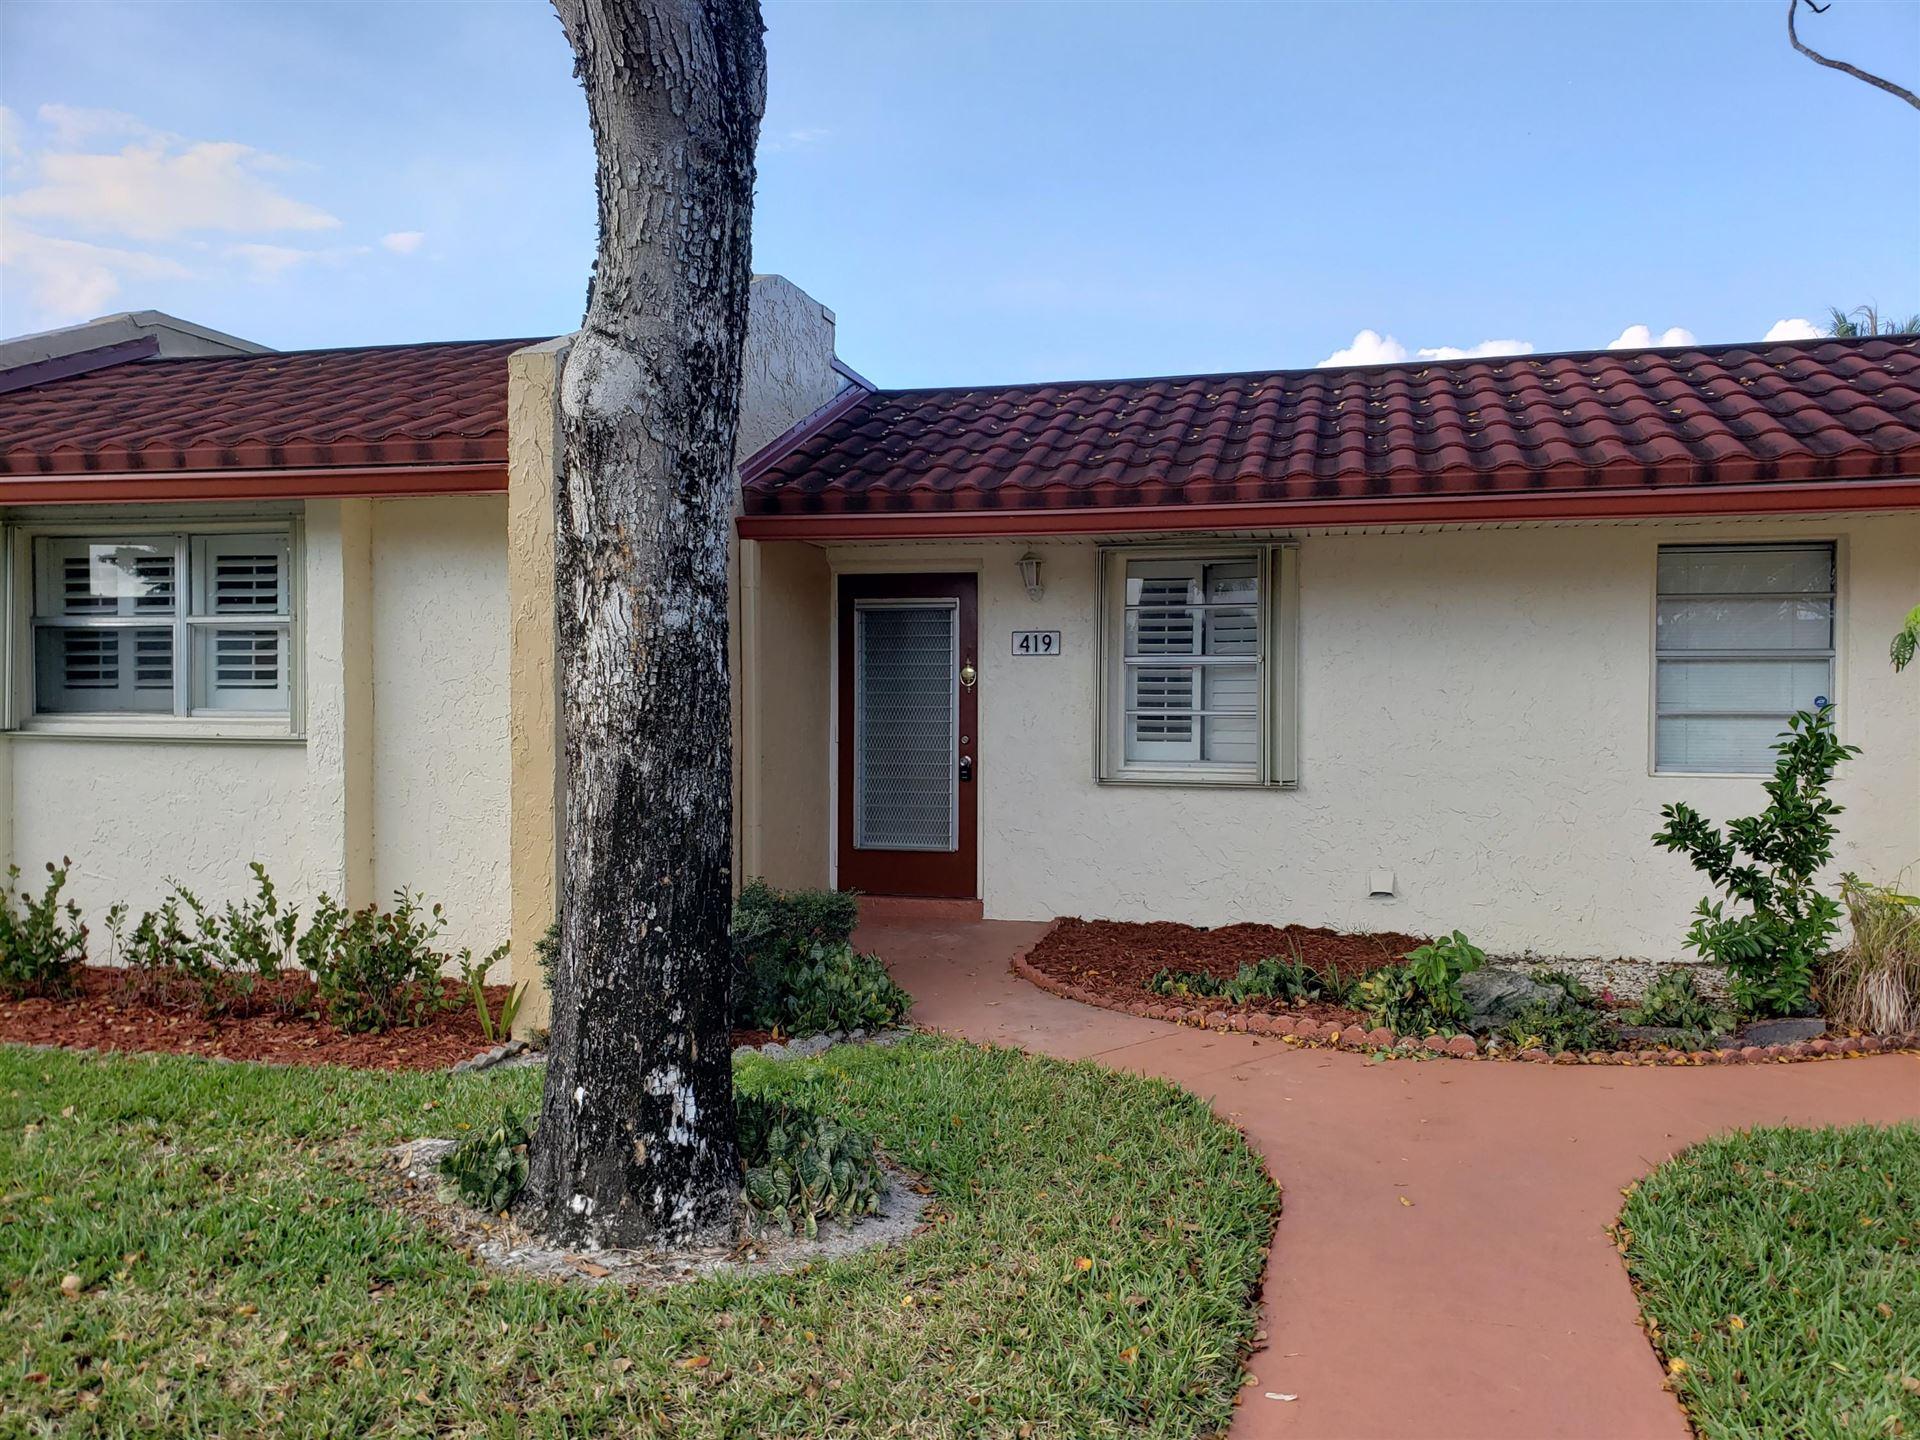 419 Lake Evelyn Drive, West Palm Beach, FL 33411 - #: RX-10614273